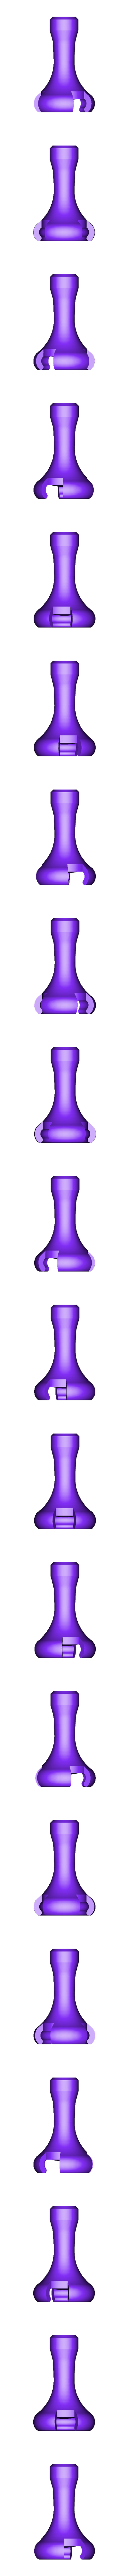 XBOX_Stick_V1_2.stl Download free STL file XBOX One stick extender for drone simulators • 3D printable object, alkobua